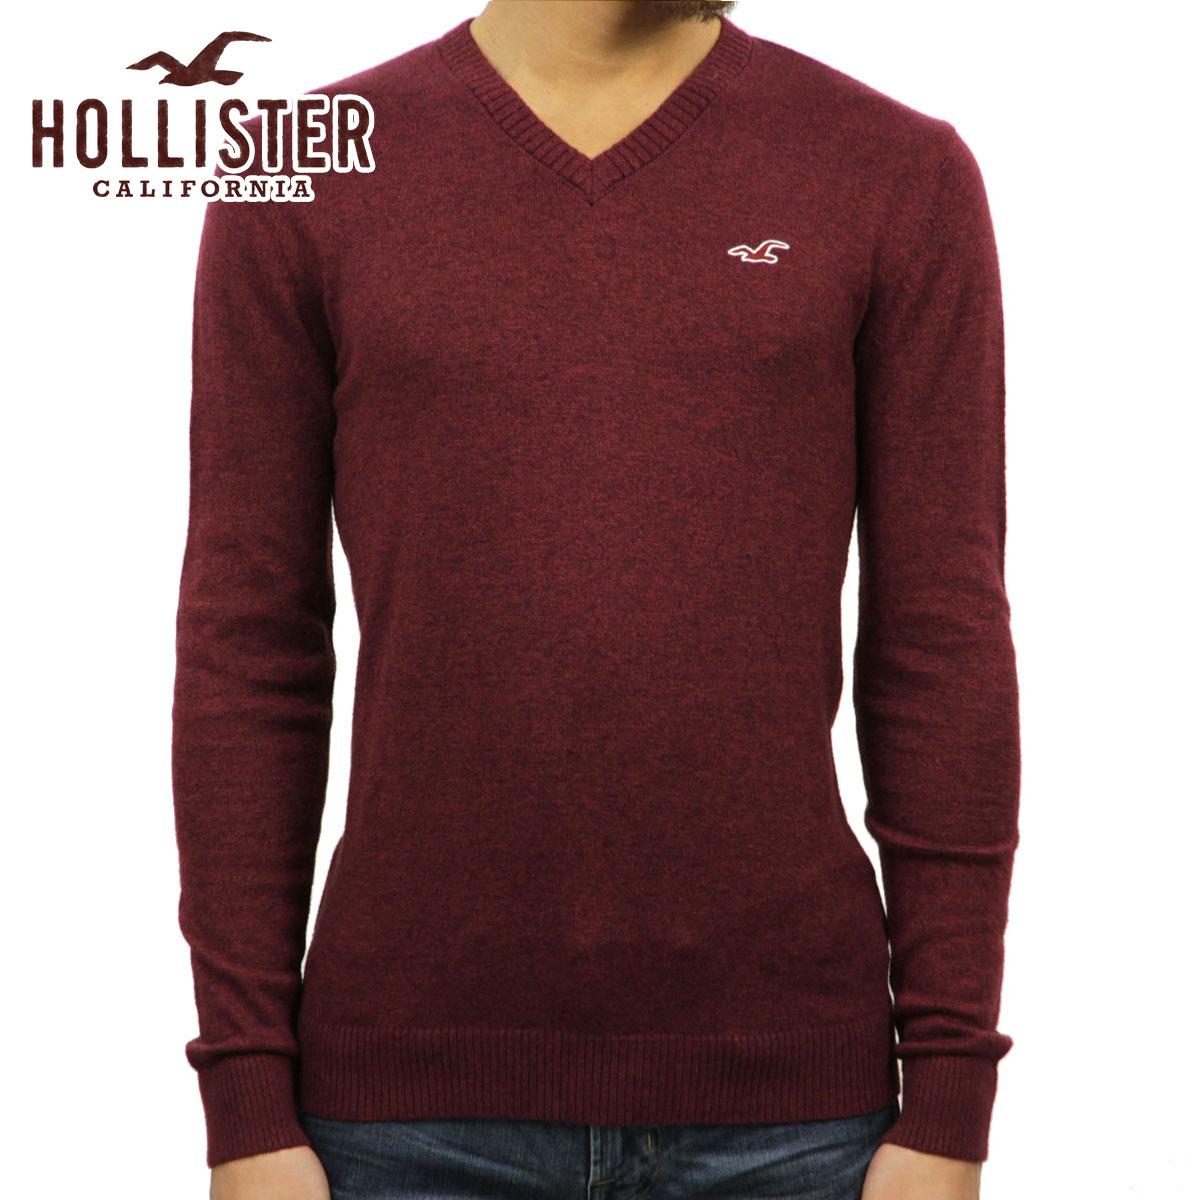 5%OFFセール 【販売期間 12/19 20:00~12/26 01:59】 ホリスター セーター メンズ 正規品 HOLLISTER Vネックセーター Lightweight V-Neck Sweater 320-201-0617-522